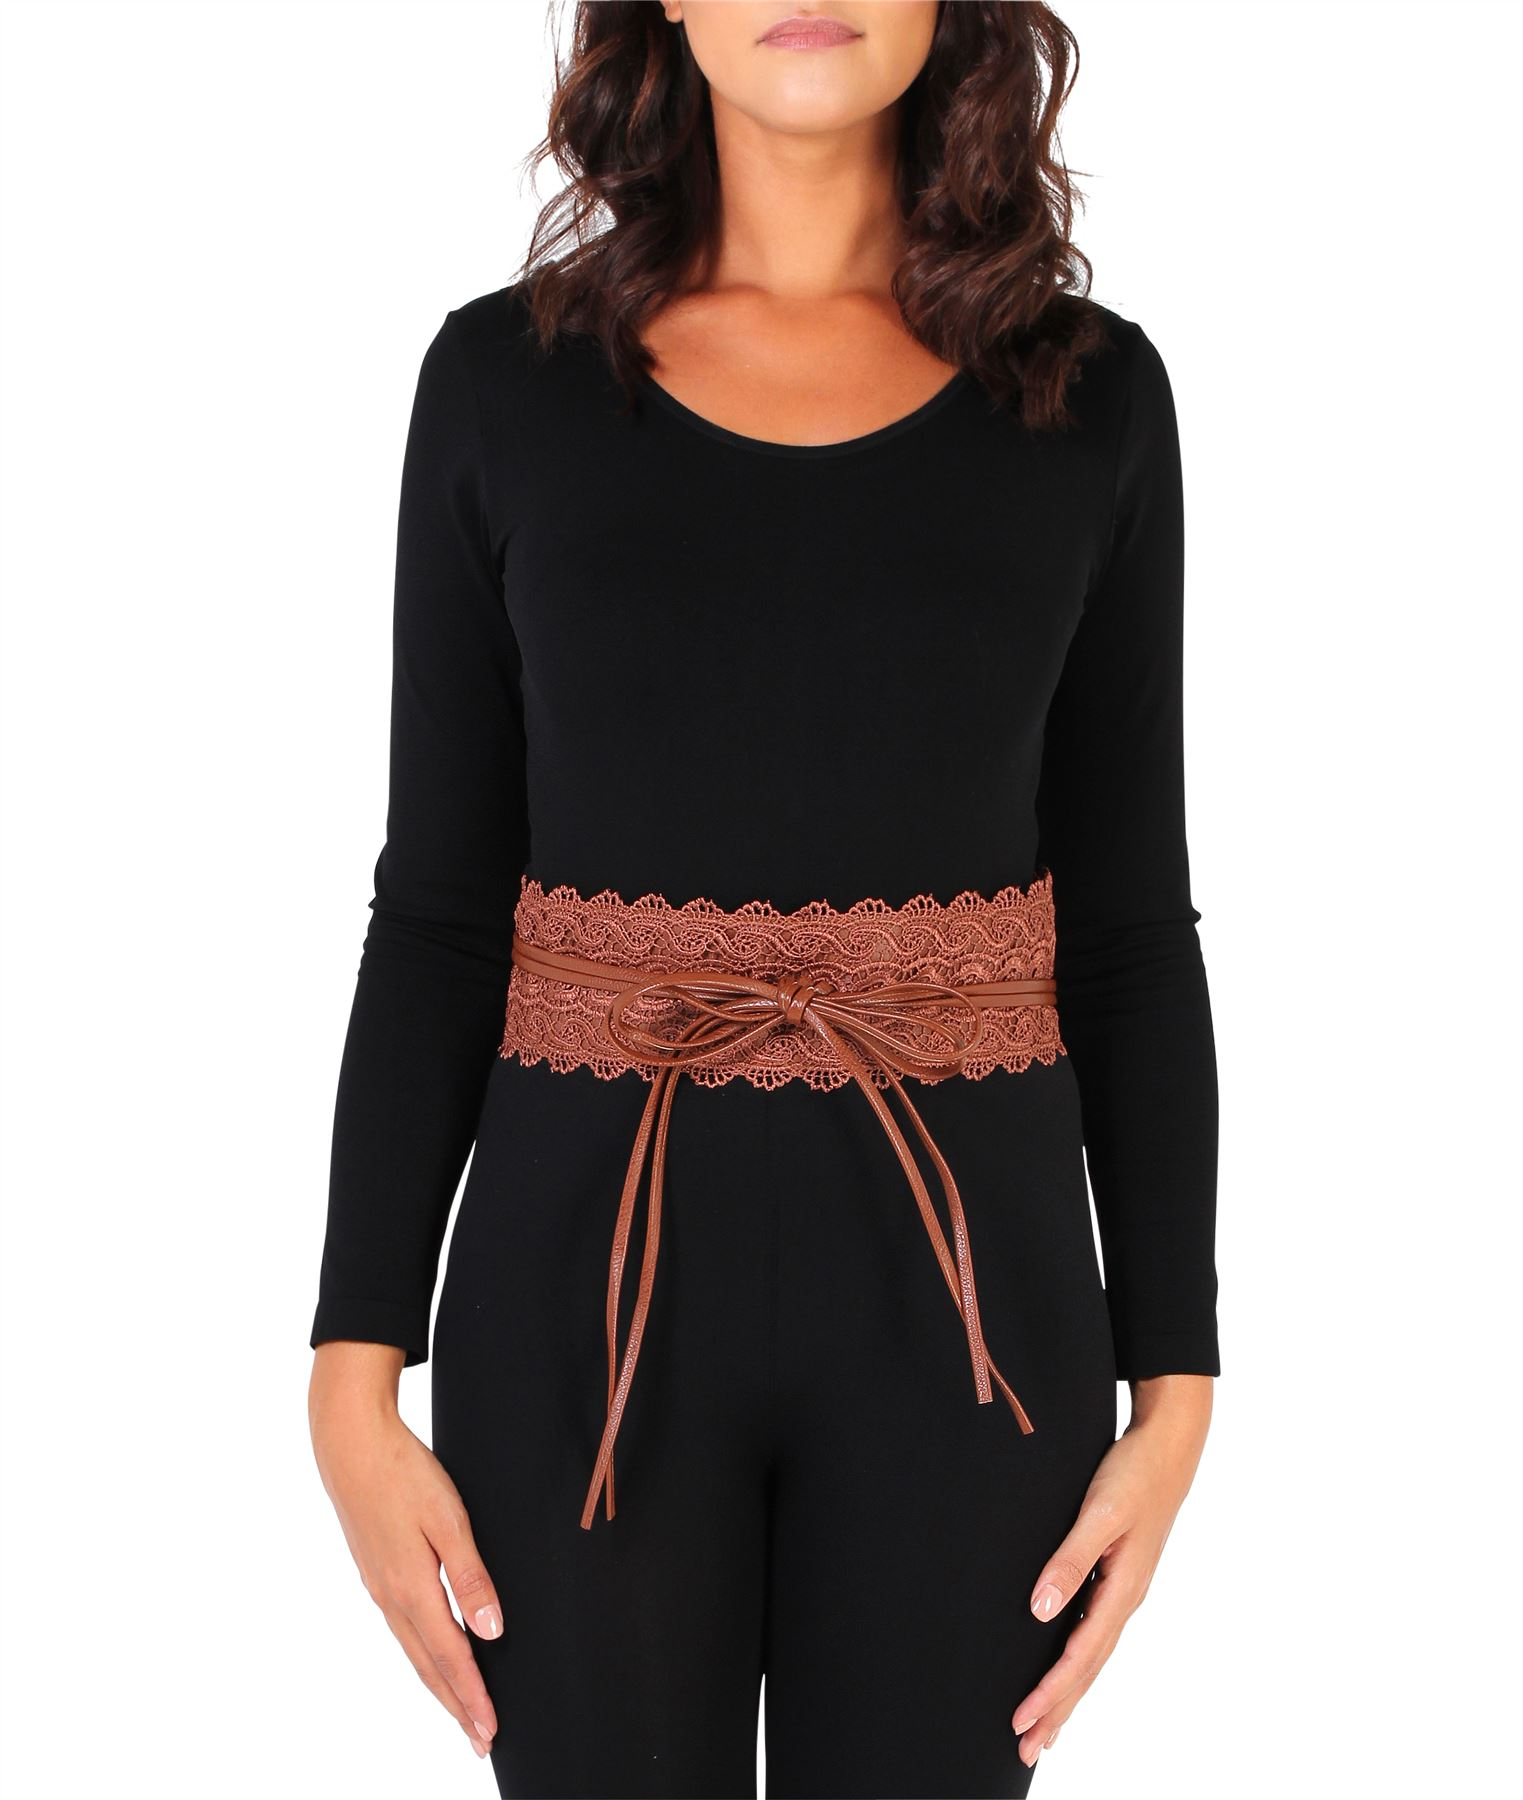 thumbnail 12 - Womens-Ladies-Wide-Waist-Belt-Floral-Waistband-Pattern-Band-Crochet-Lace-Corset